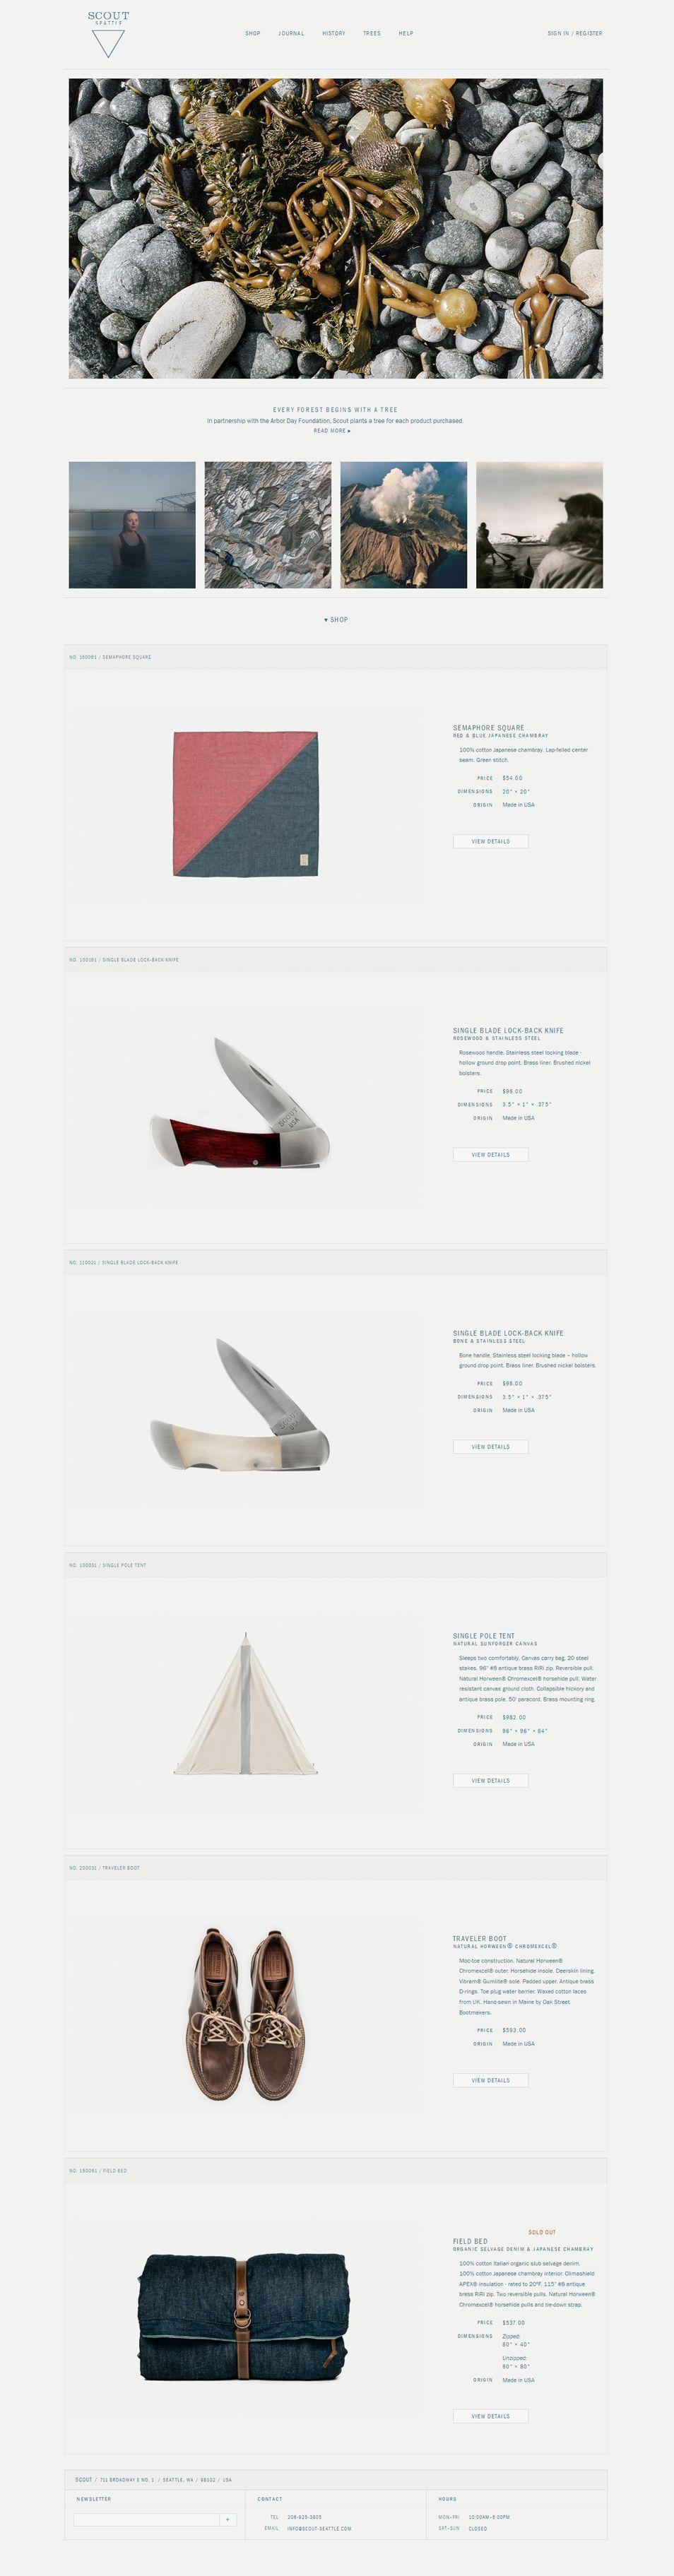 Scout Seattle Web Development Design Web Design Gallery Speculative Design